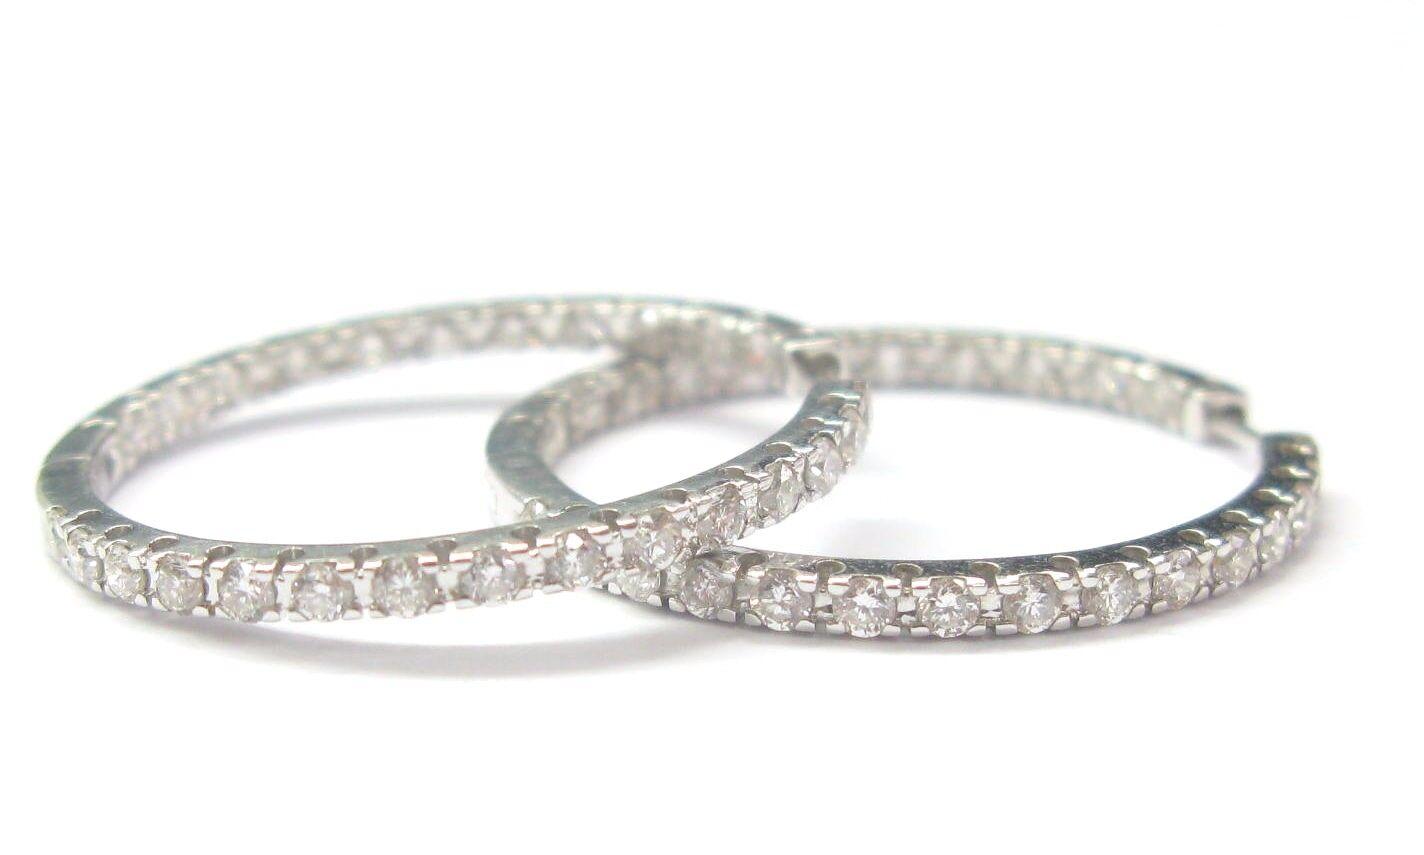 18Kt Inside Out Diamond Hoop Earrings White gold 1.70CT 1